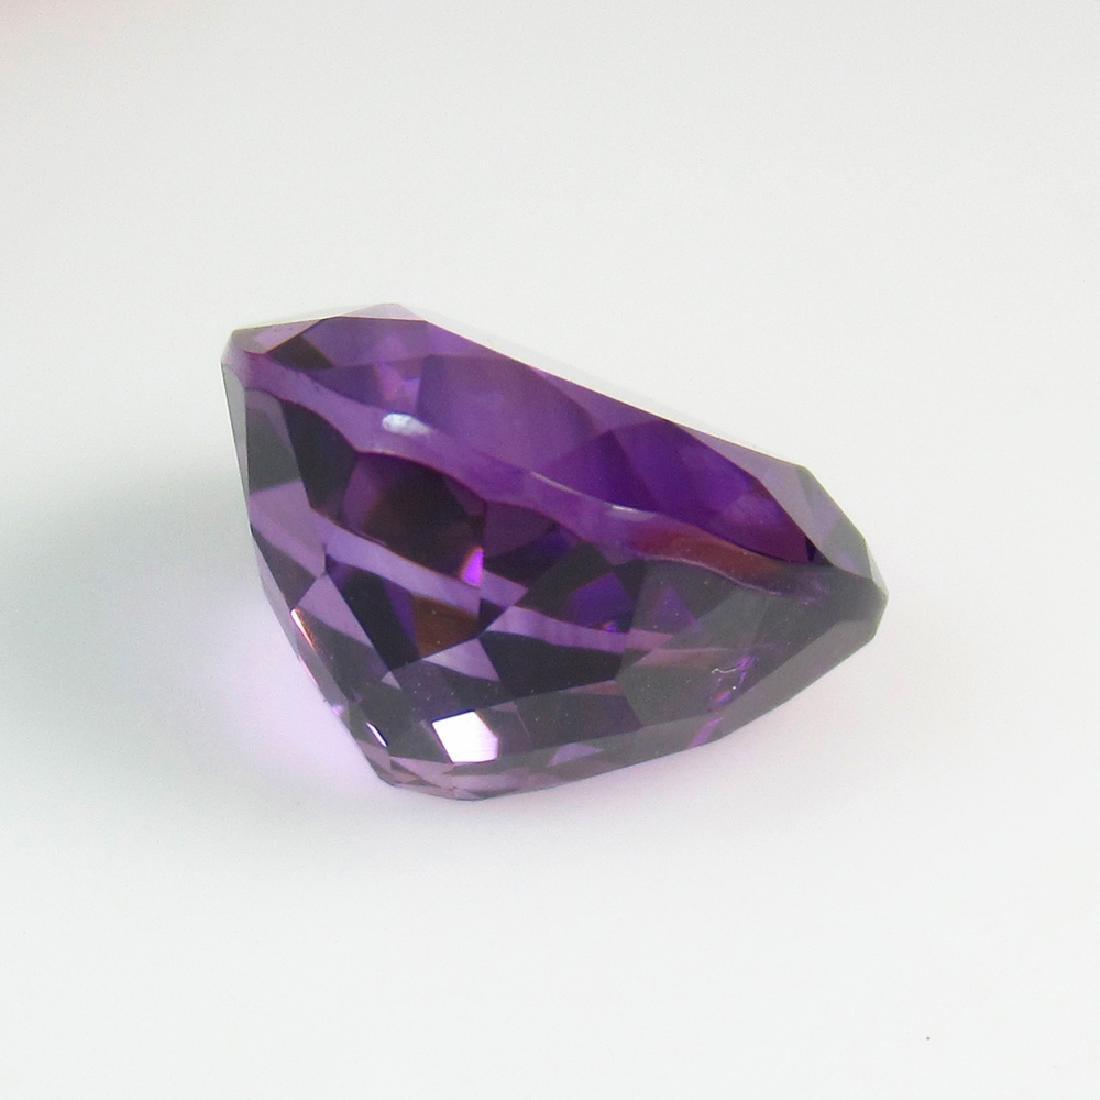 7.56 Ct Genuine Brazil Purple Amethyst Pear Cut - 2